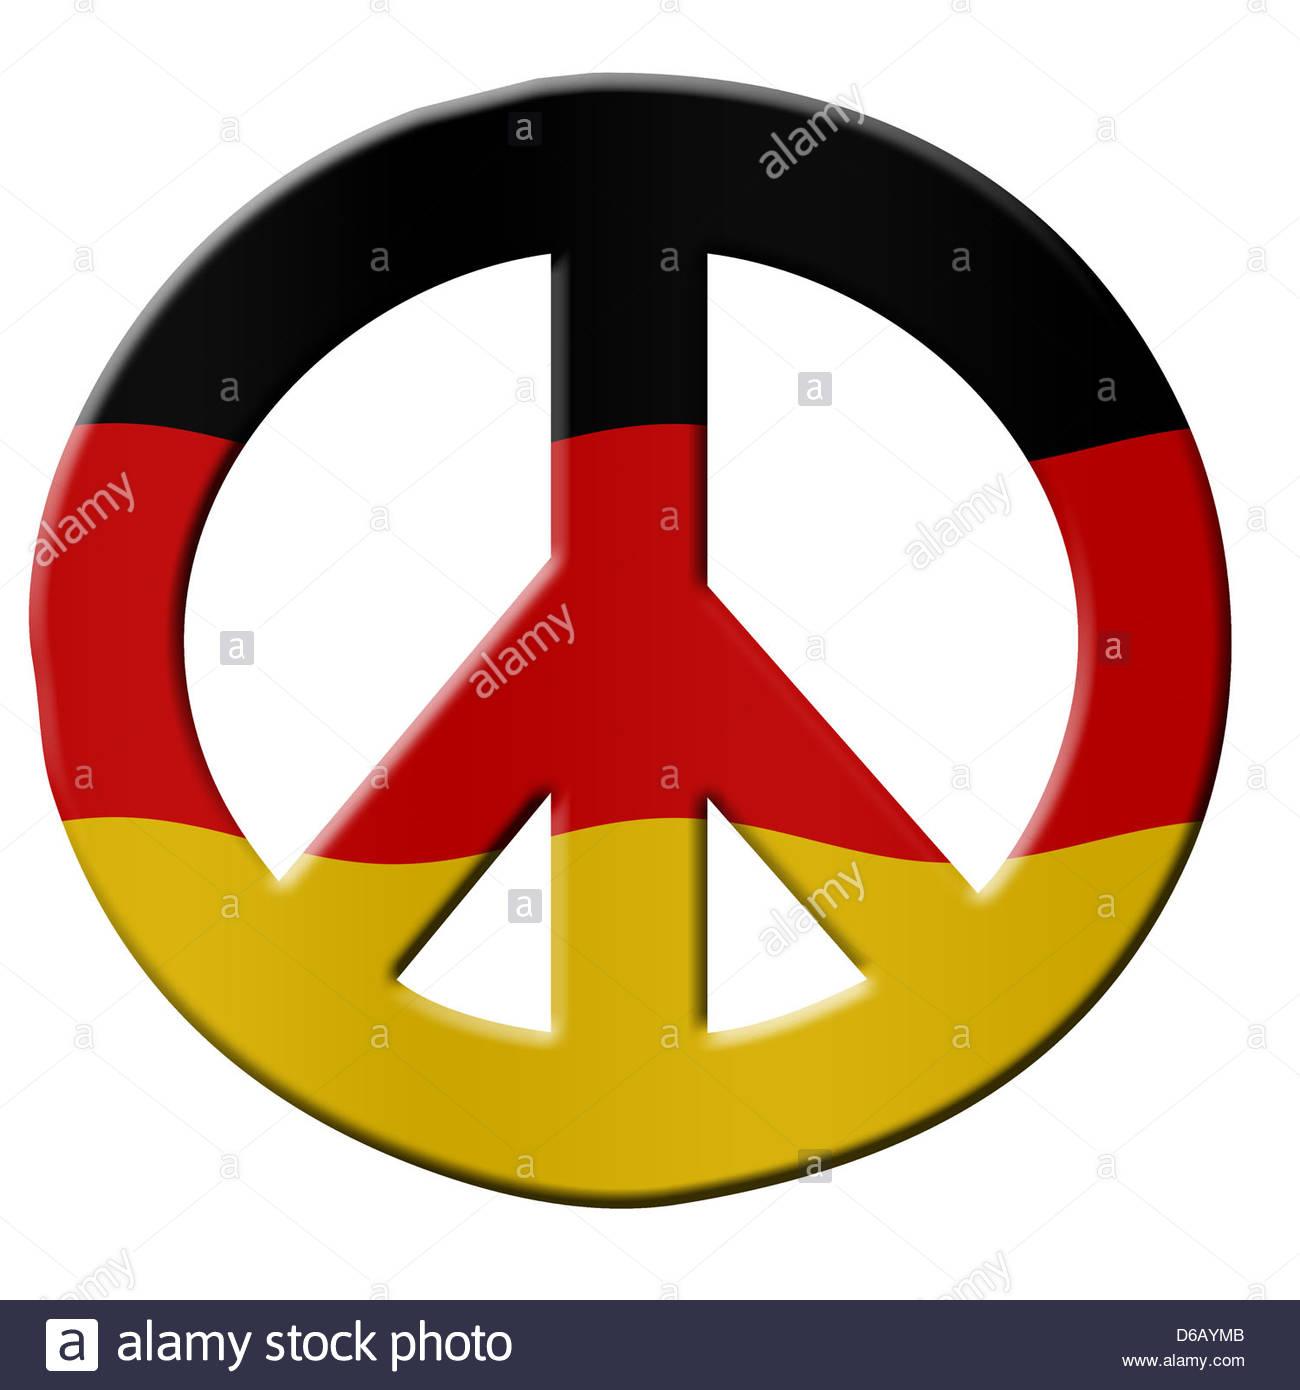 Digital illustration german flag with peace symbol stock photo german flag with peace symbol biocorpaavc